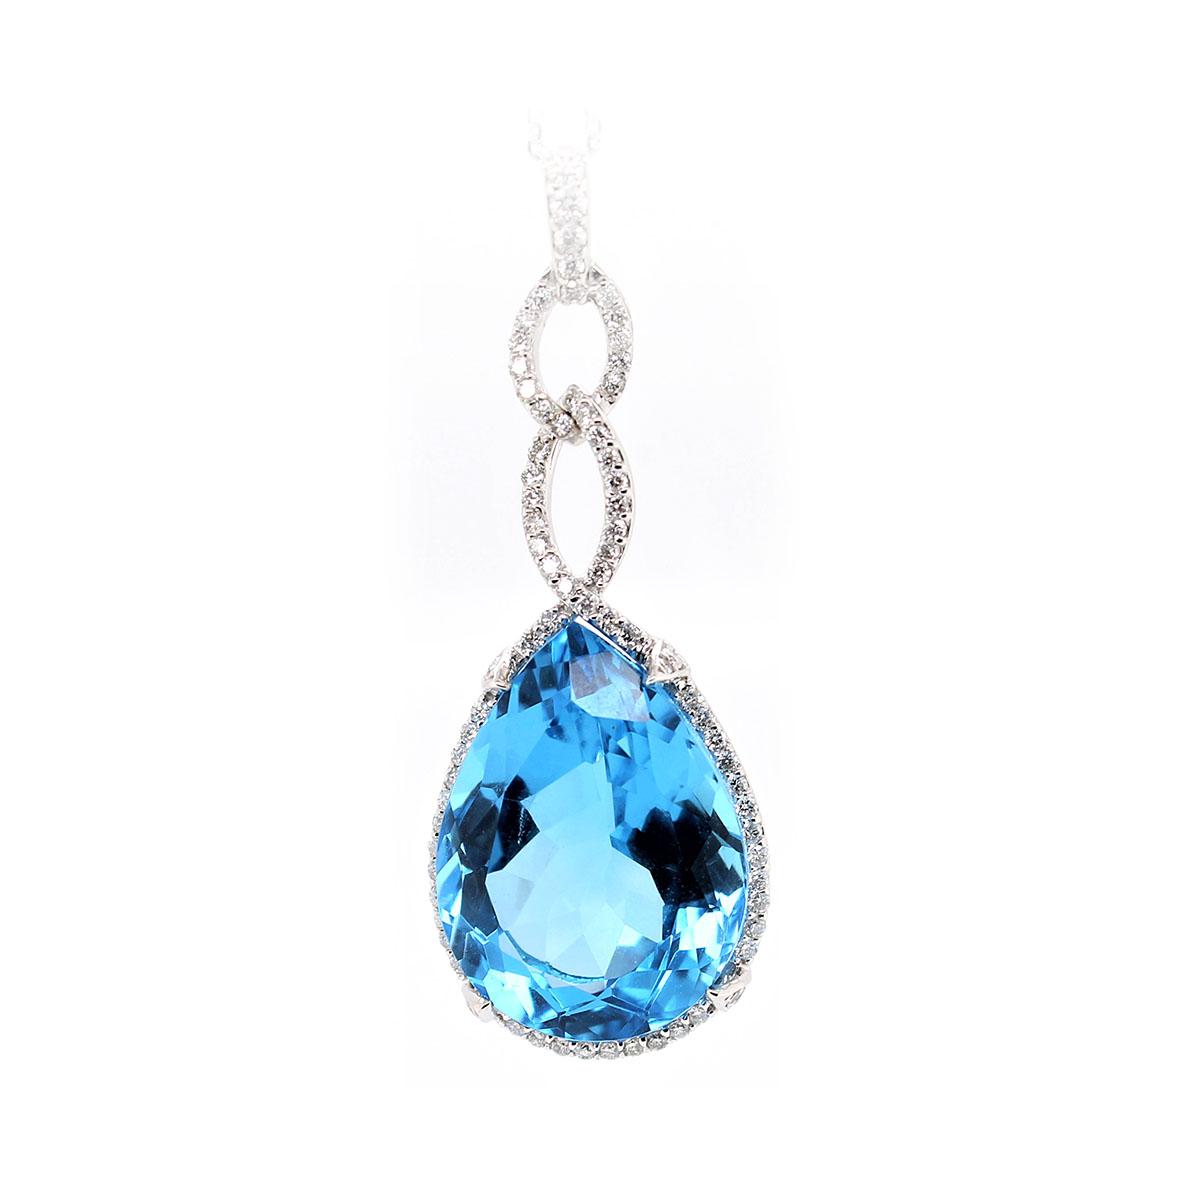 14 Karat White Gold Pear Shaped Blue Topaz and Diamond Necklace